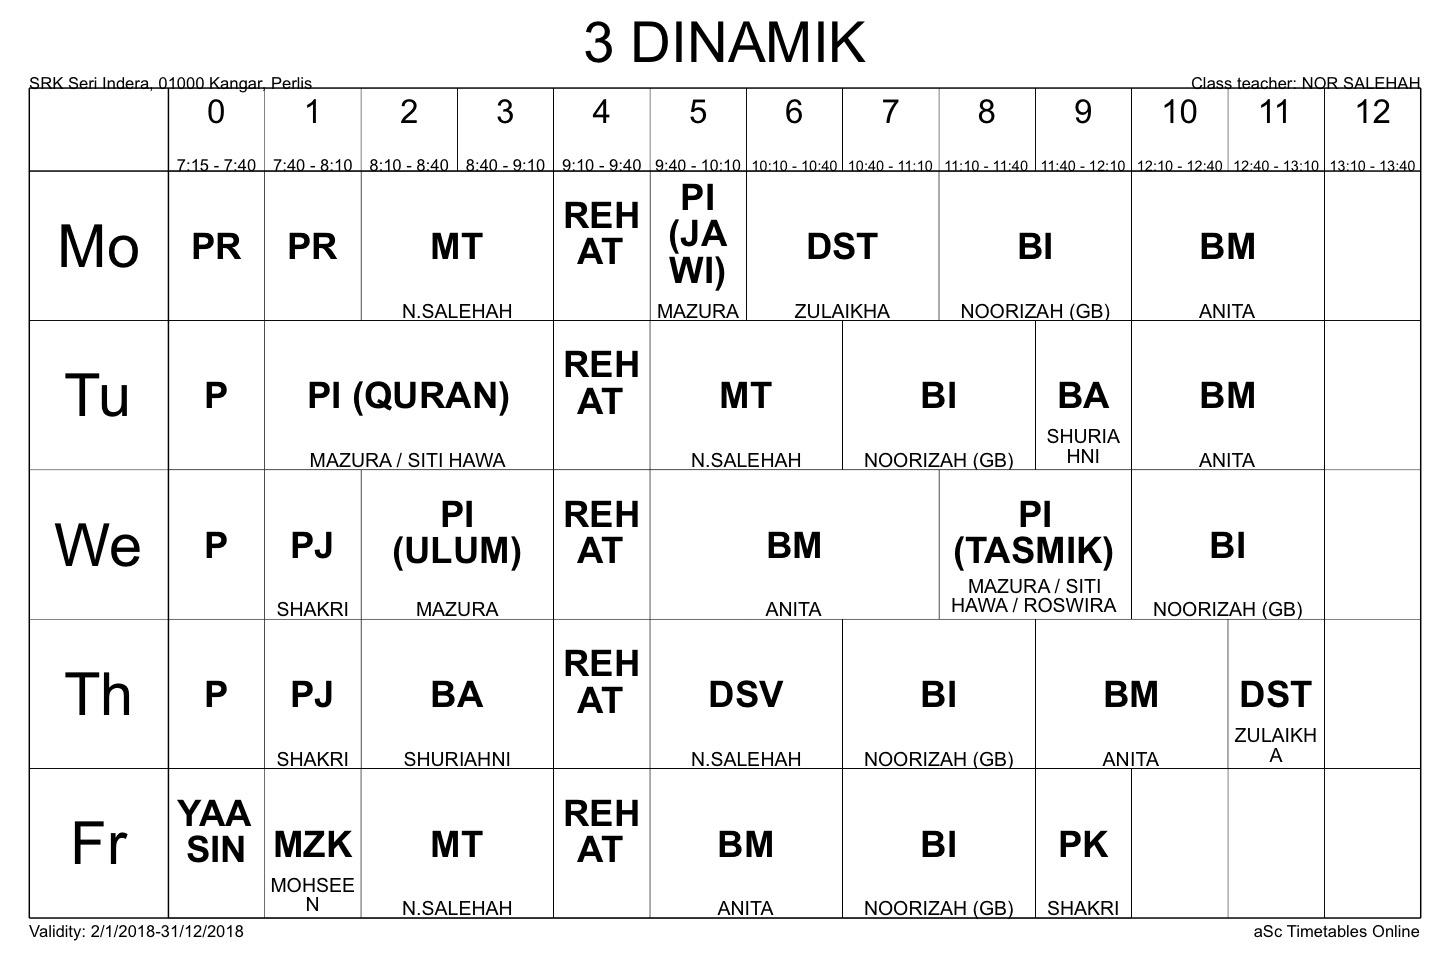 Jadual Waktu Kelas 3 Dinamik Fawwaz 2018 Srk Seri Indera Omaq Org